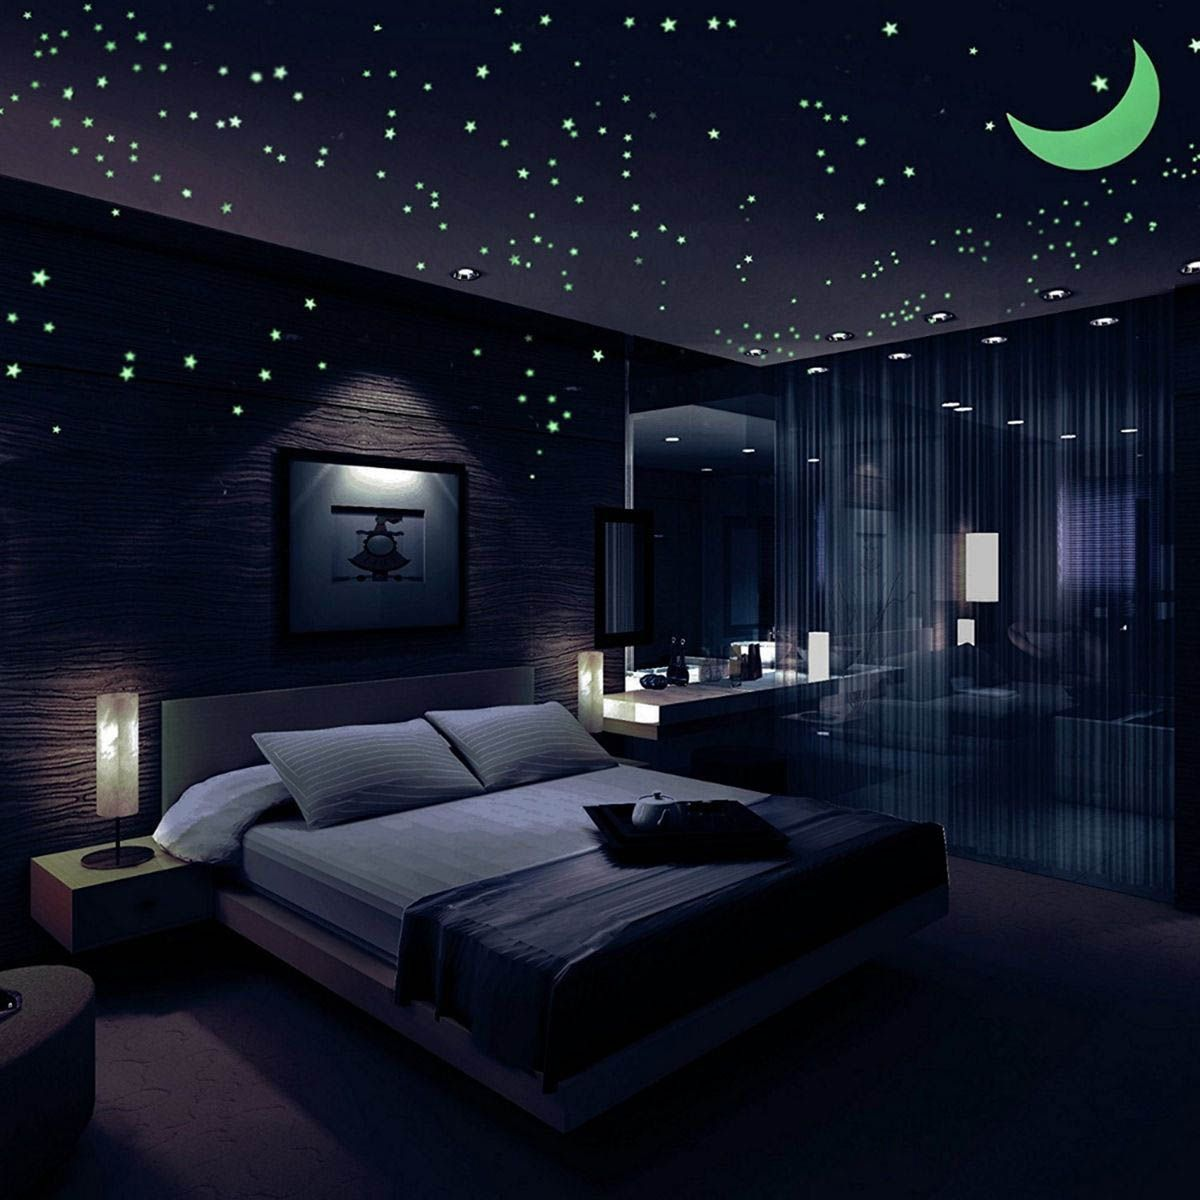 The Very Best Cheap Romantic Bedroom Ideas Modern Bedroom Decor